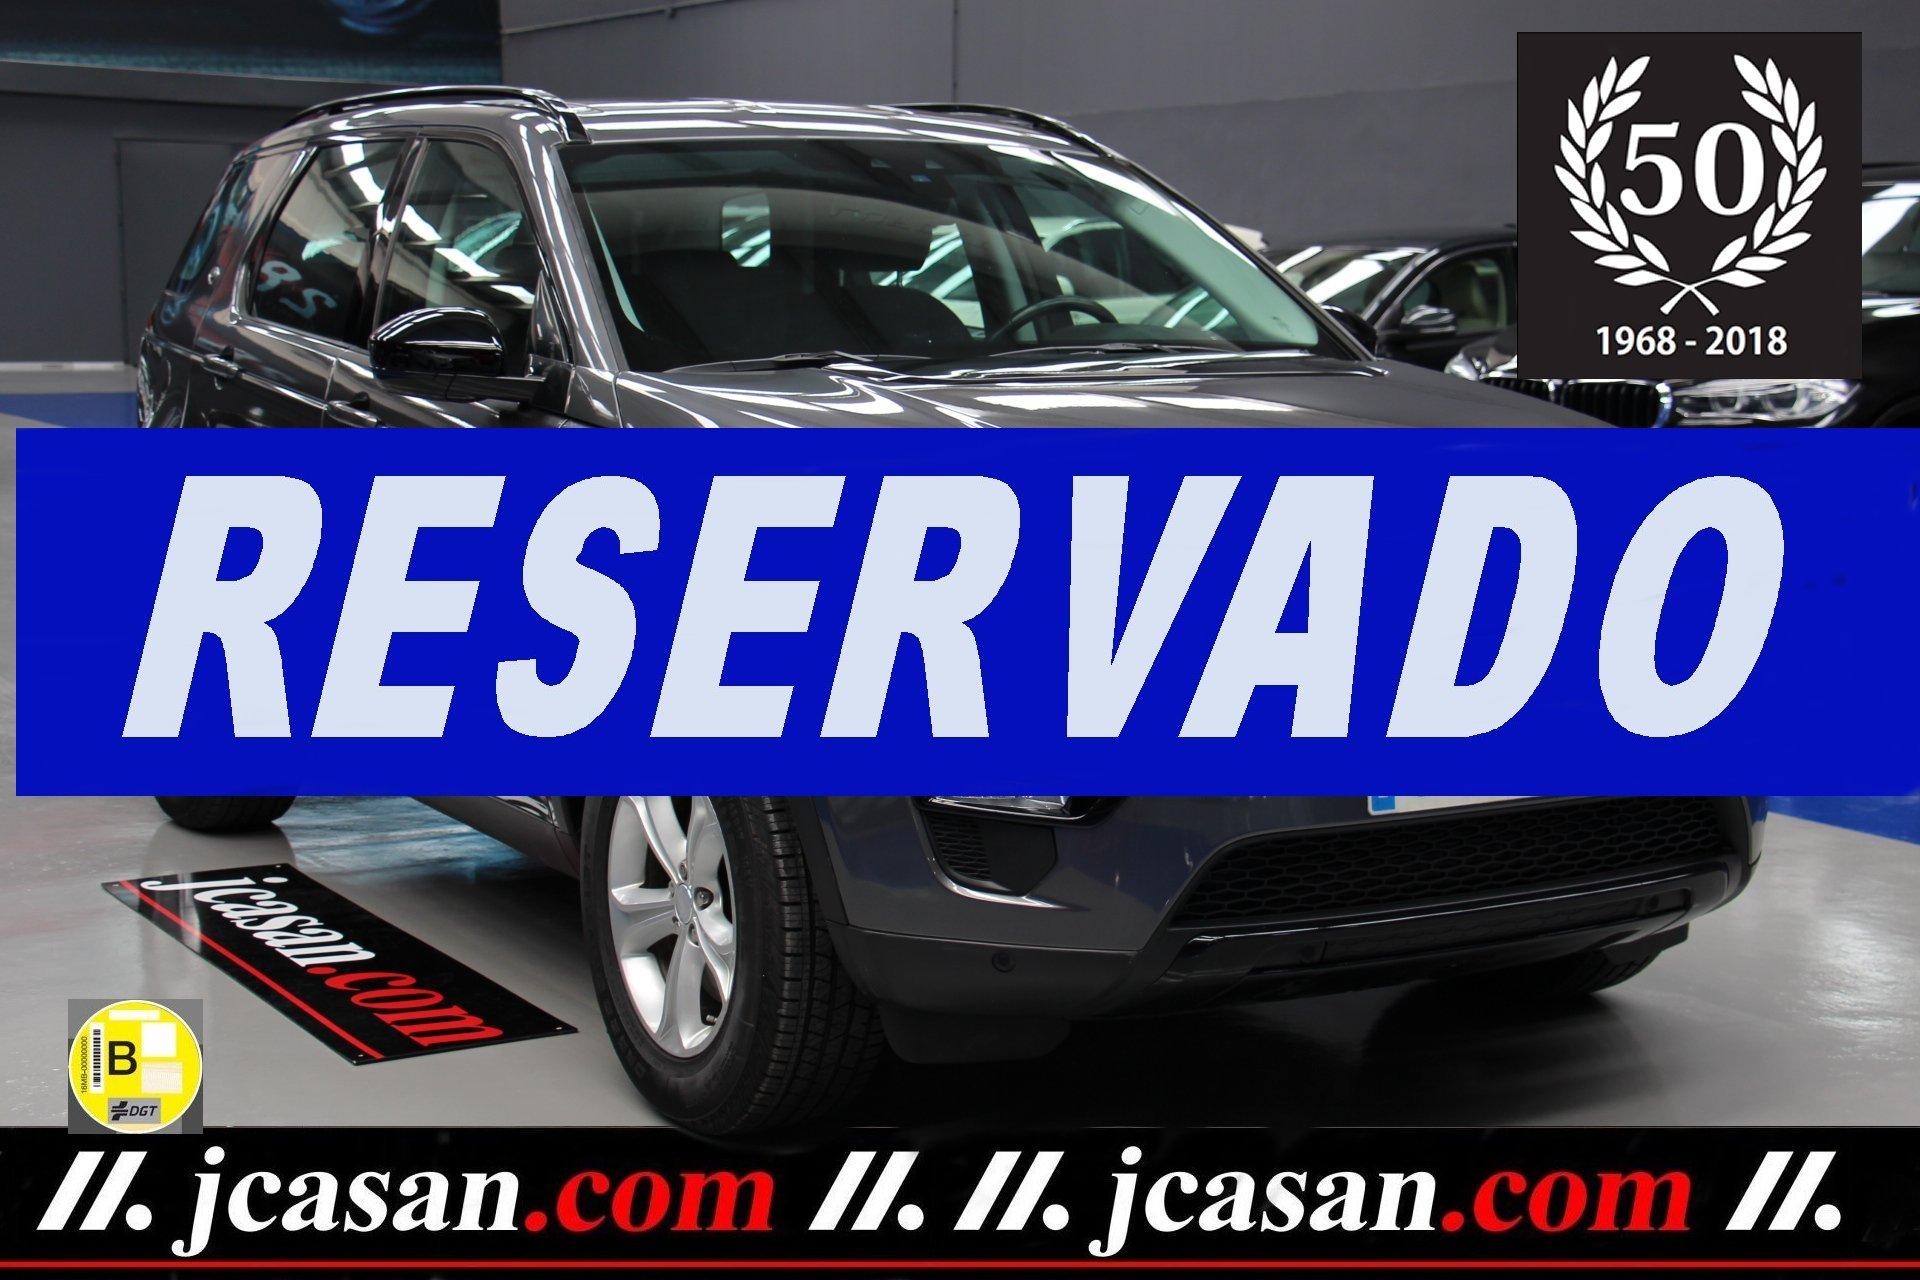 LAND ROVER DISCOVERY SPORT 2.0 TD4 150 CV 4WD SE 7 PLAZAS